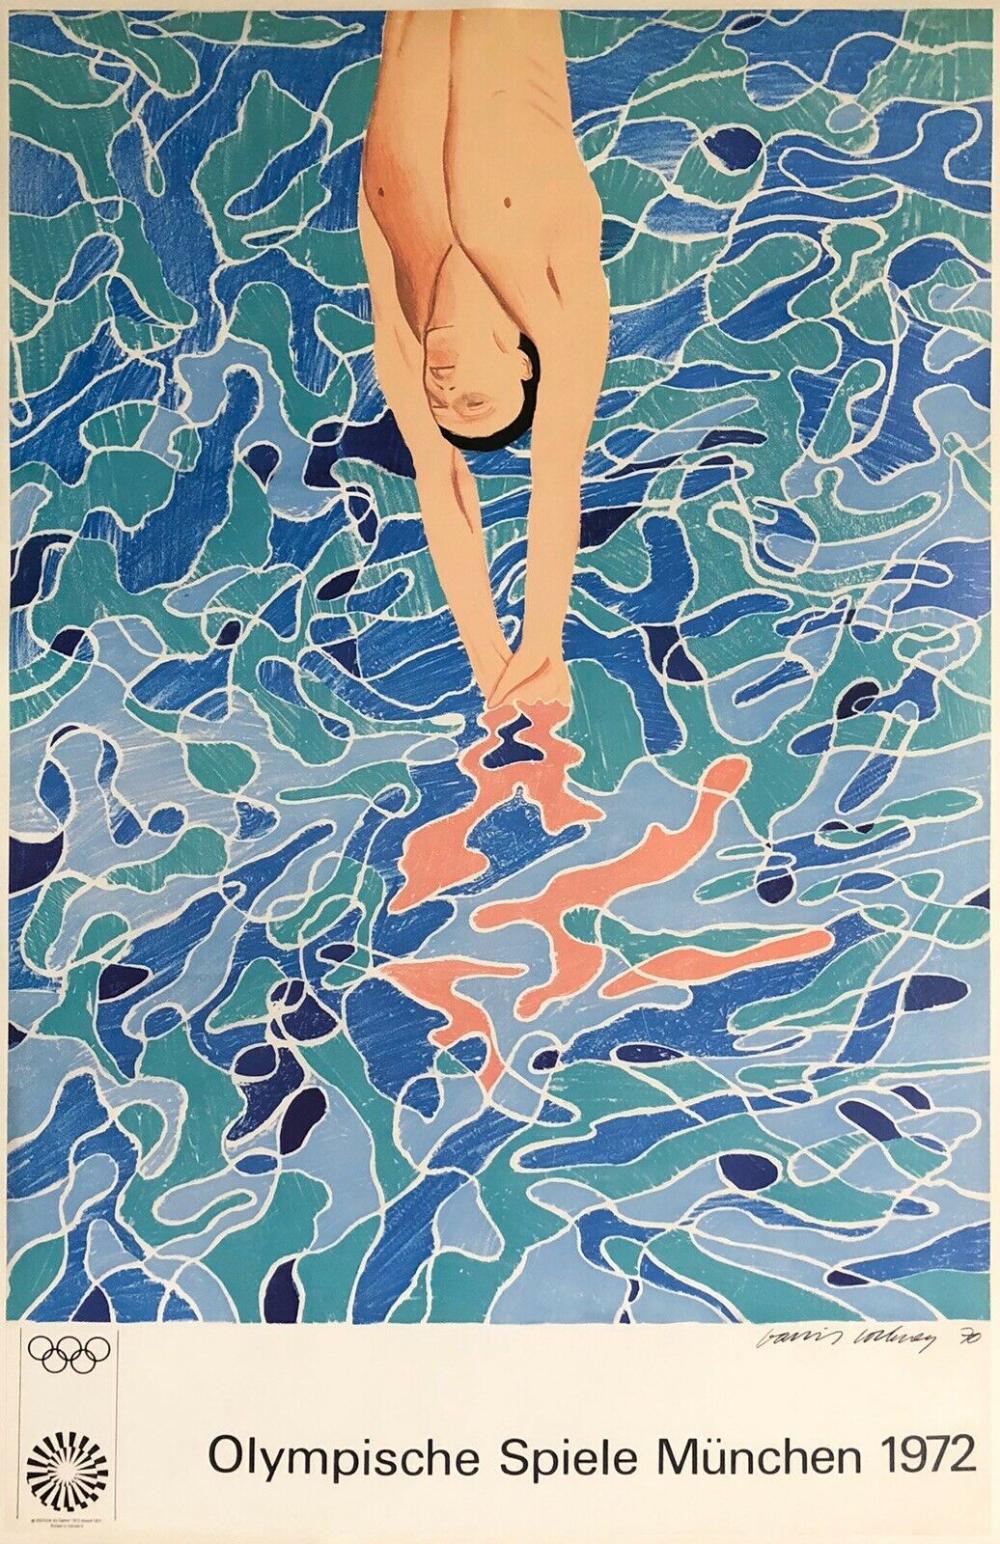 Print David Hockney Wall Art Munich Olympic Poster 1972